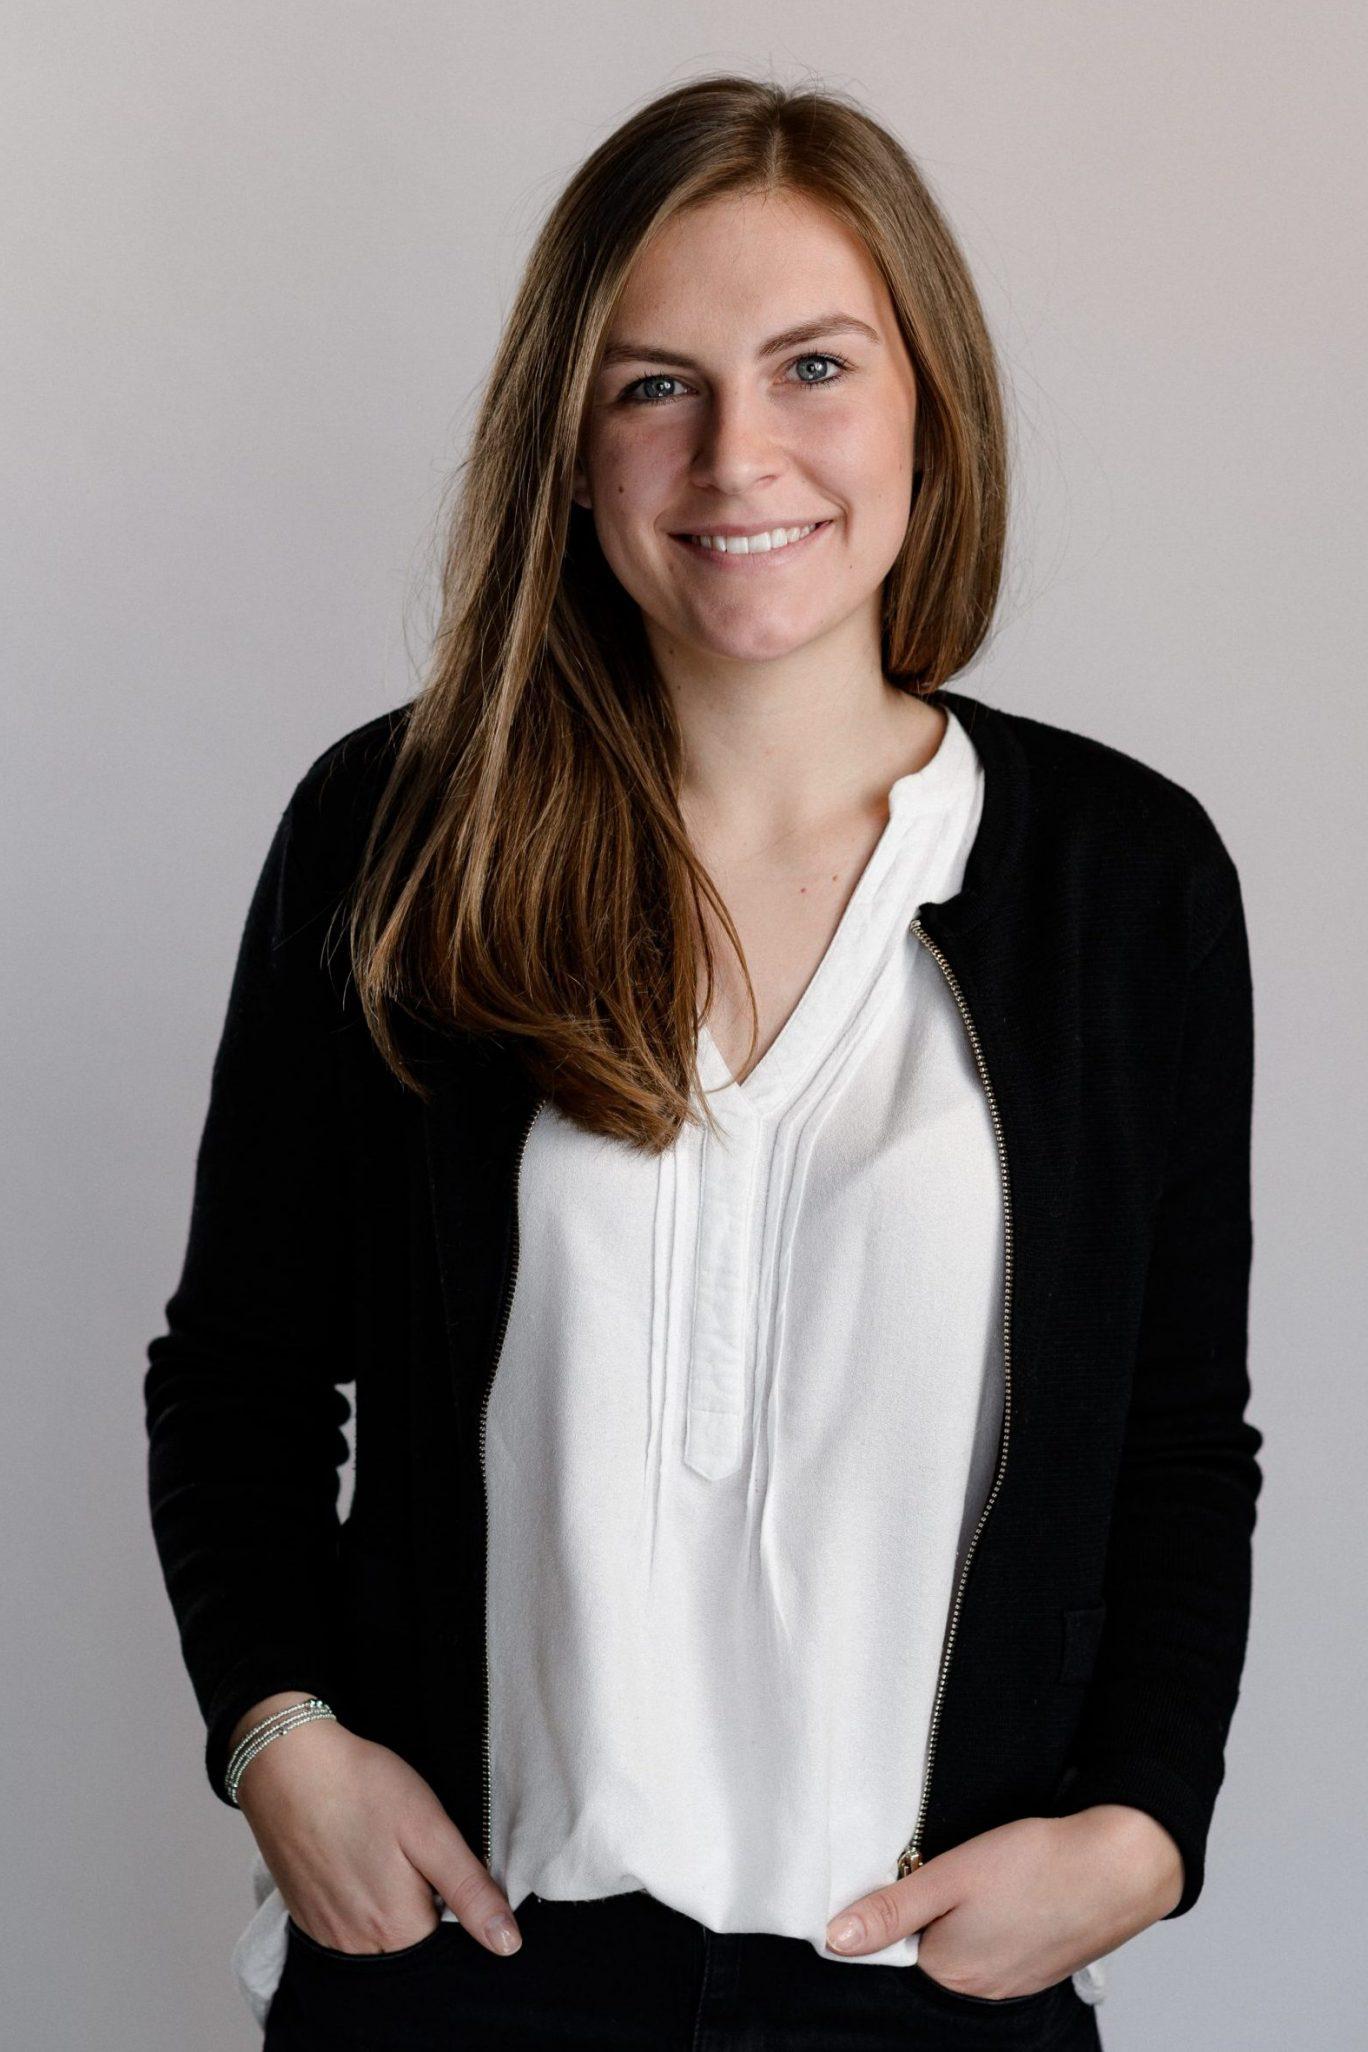 Olivia Prenntzell